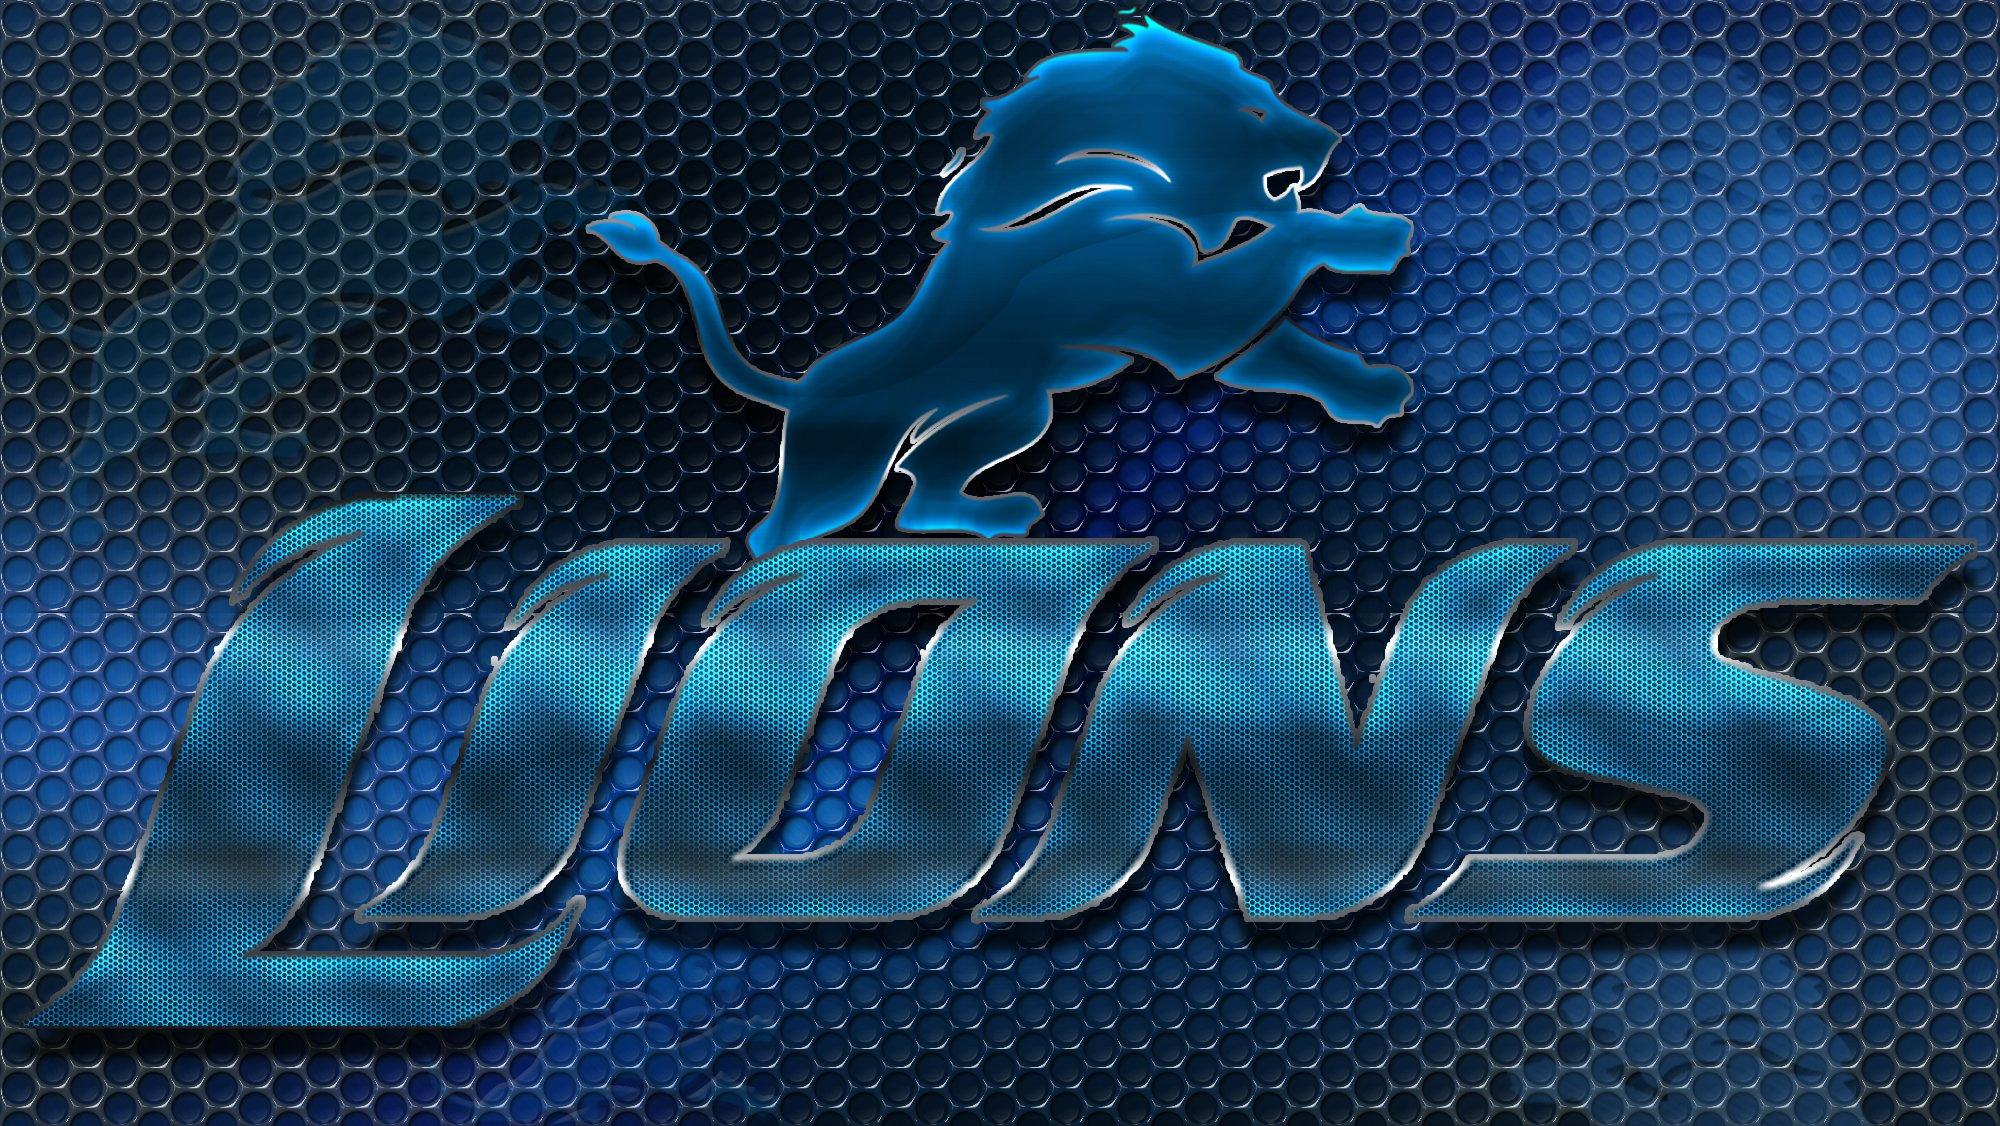 Detroit Lions Football Team Logo Wallpapers HD 2000x1126